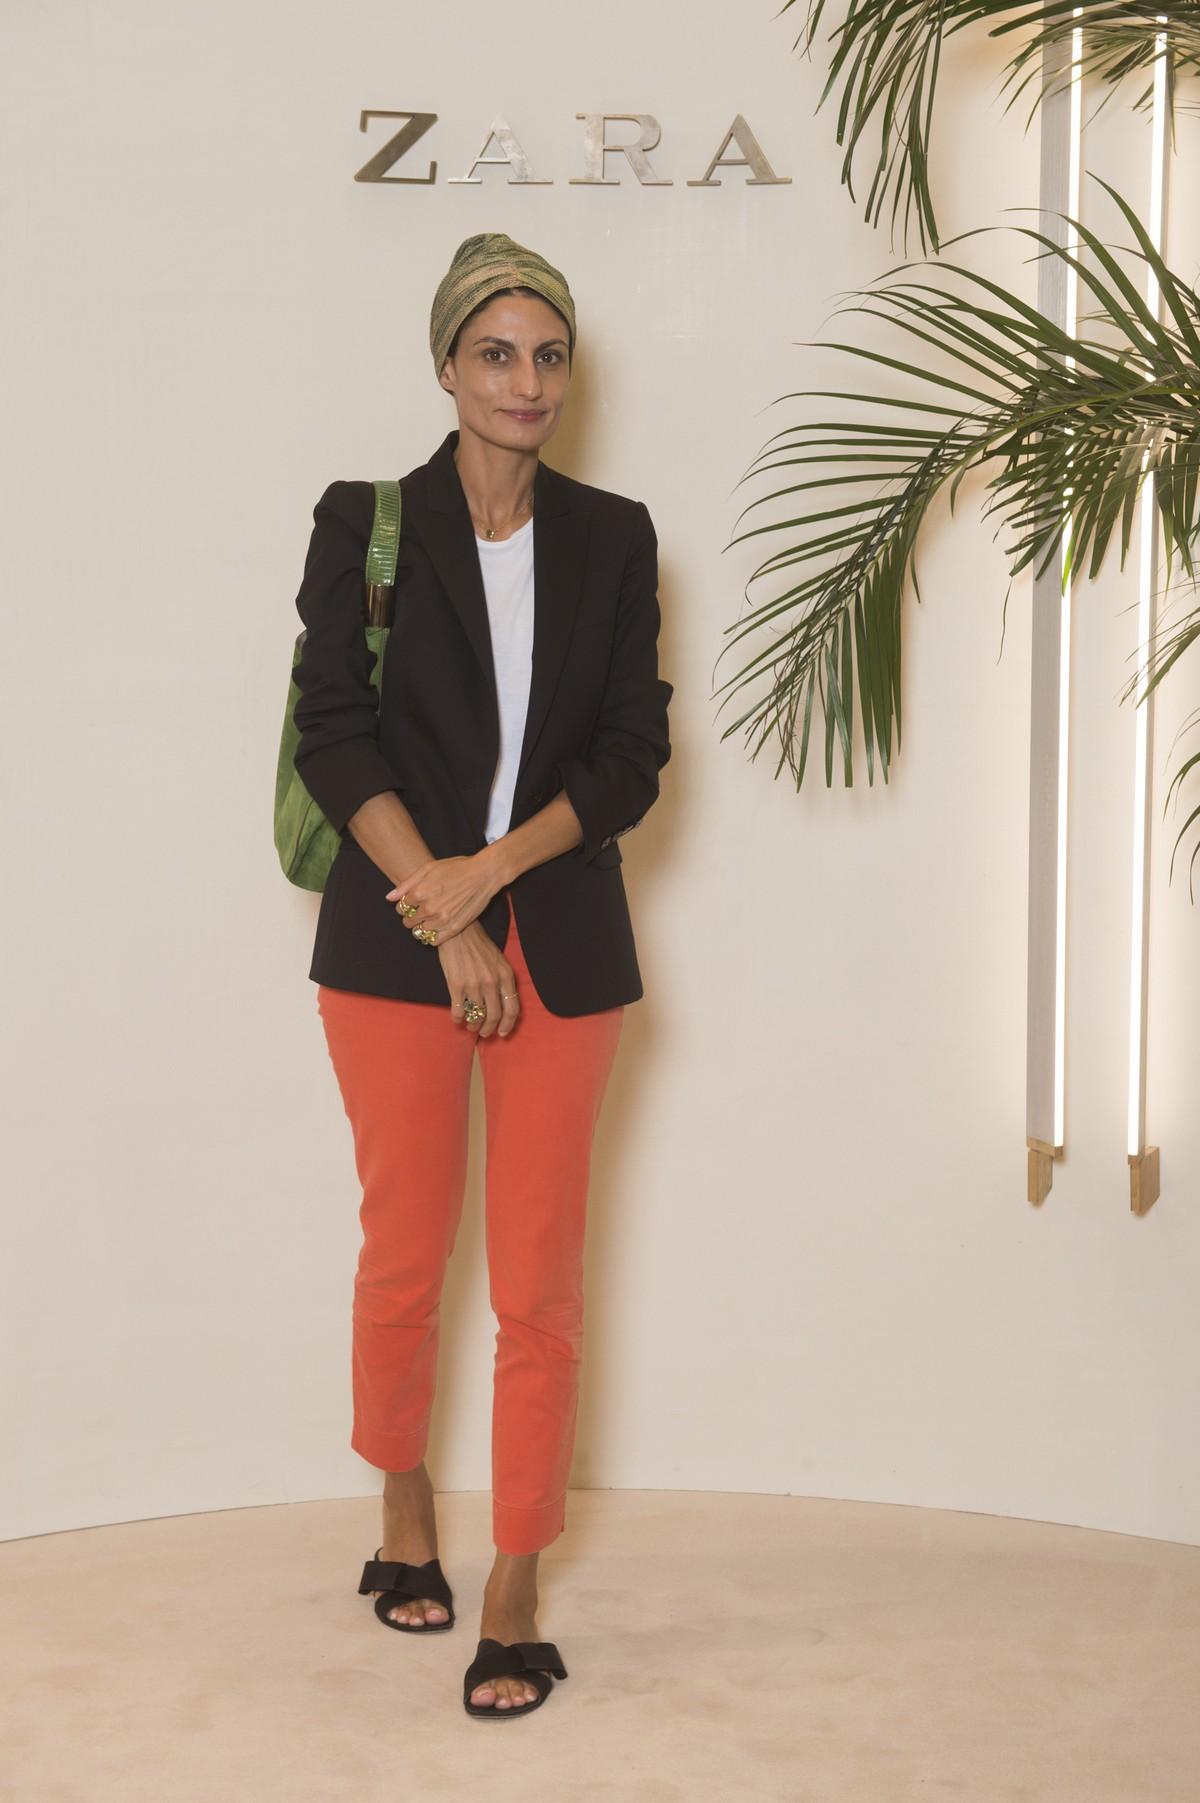 Zara Corso Vittorio Emanuele Milano riapertura